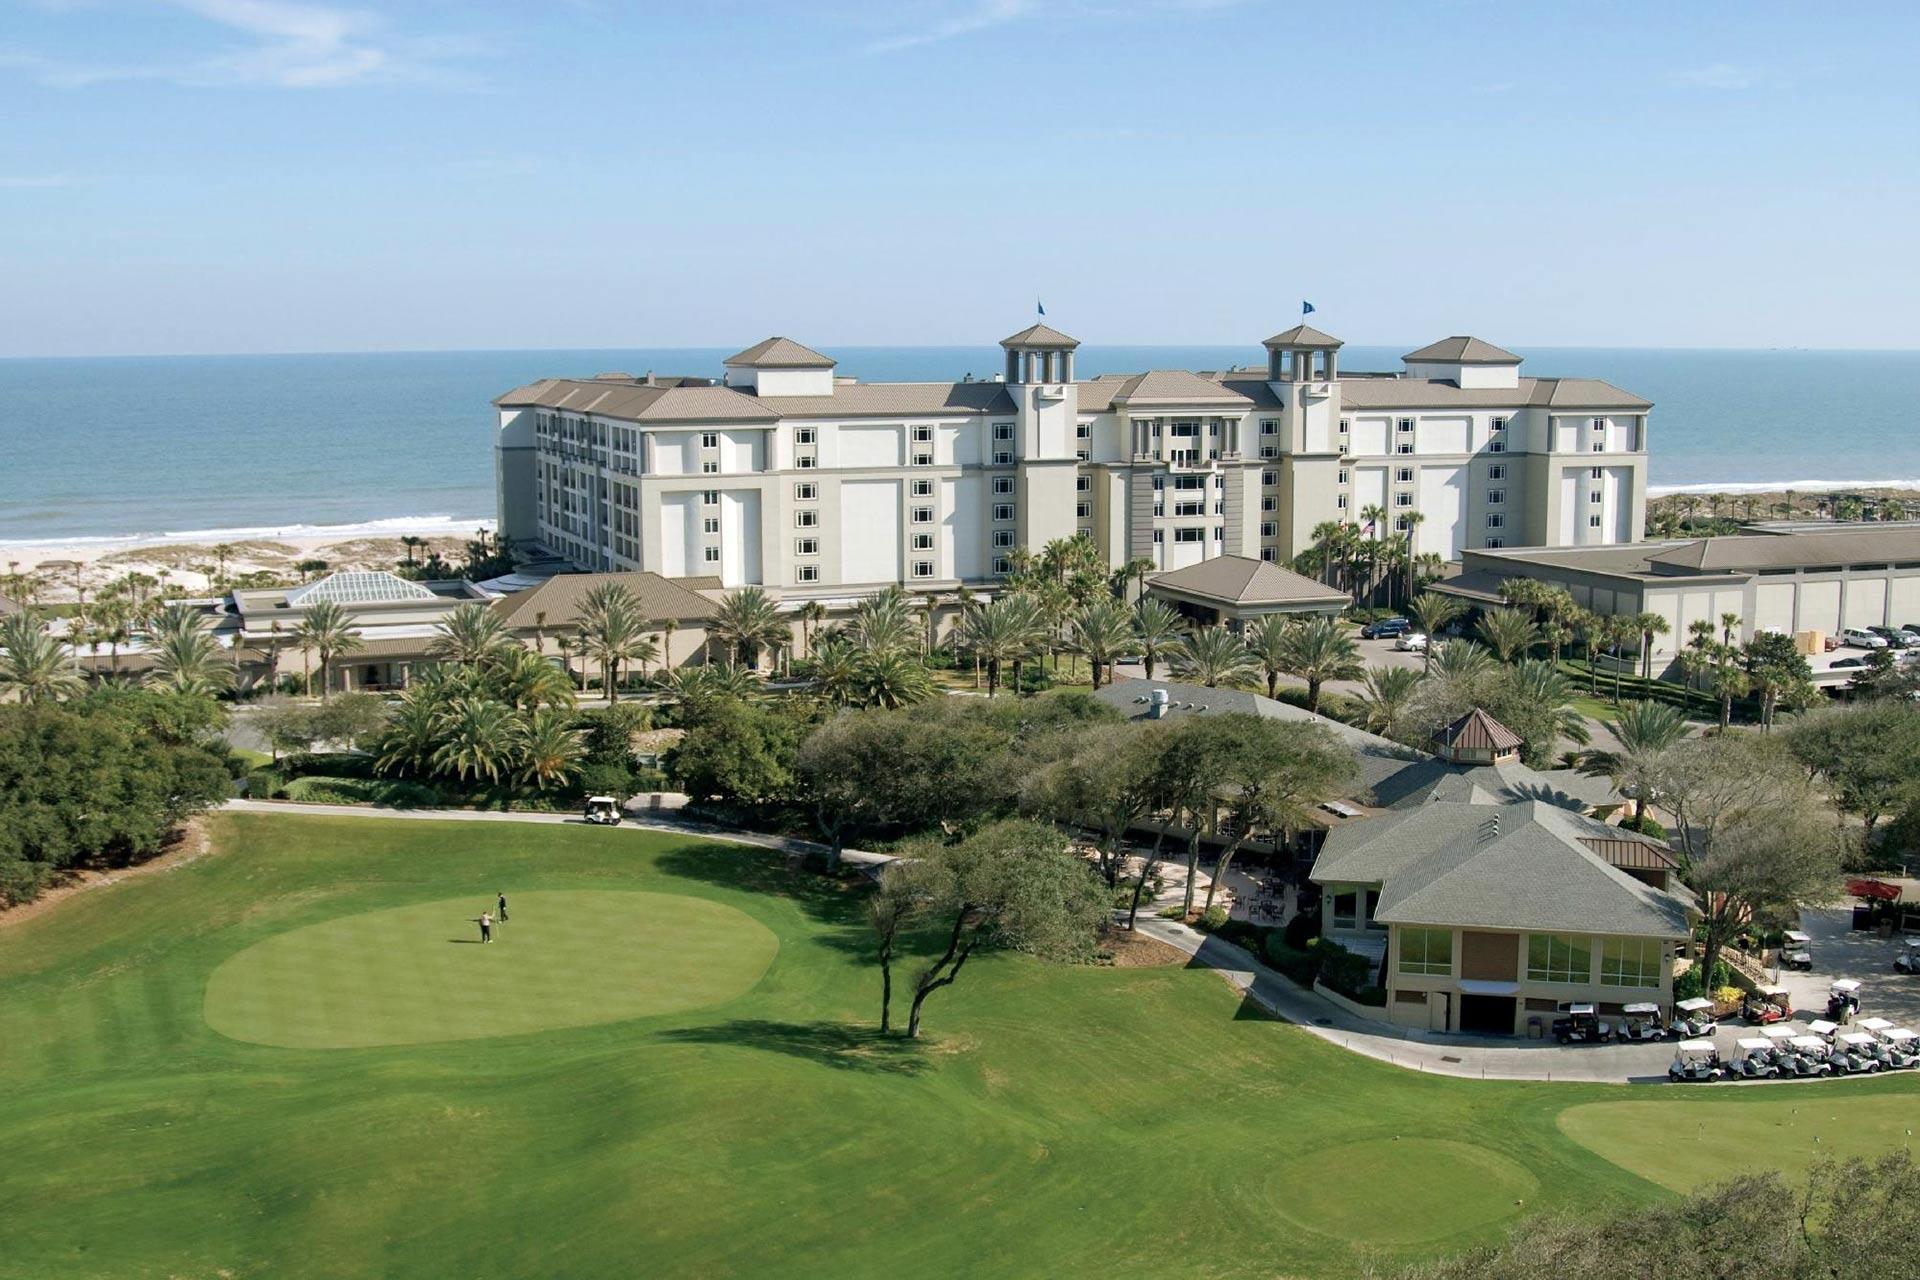 The Ritz-Carlton, Amelia Island in Amelia Island, Florida